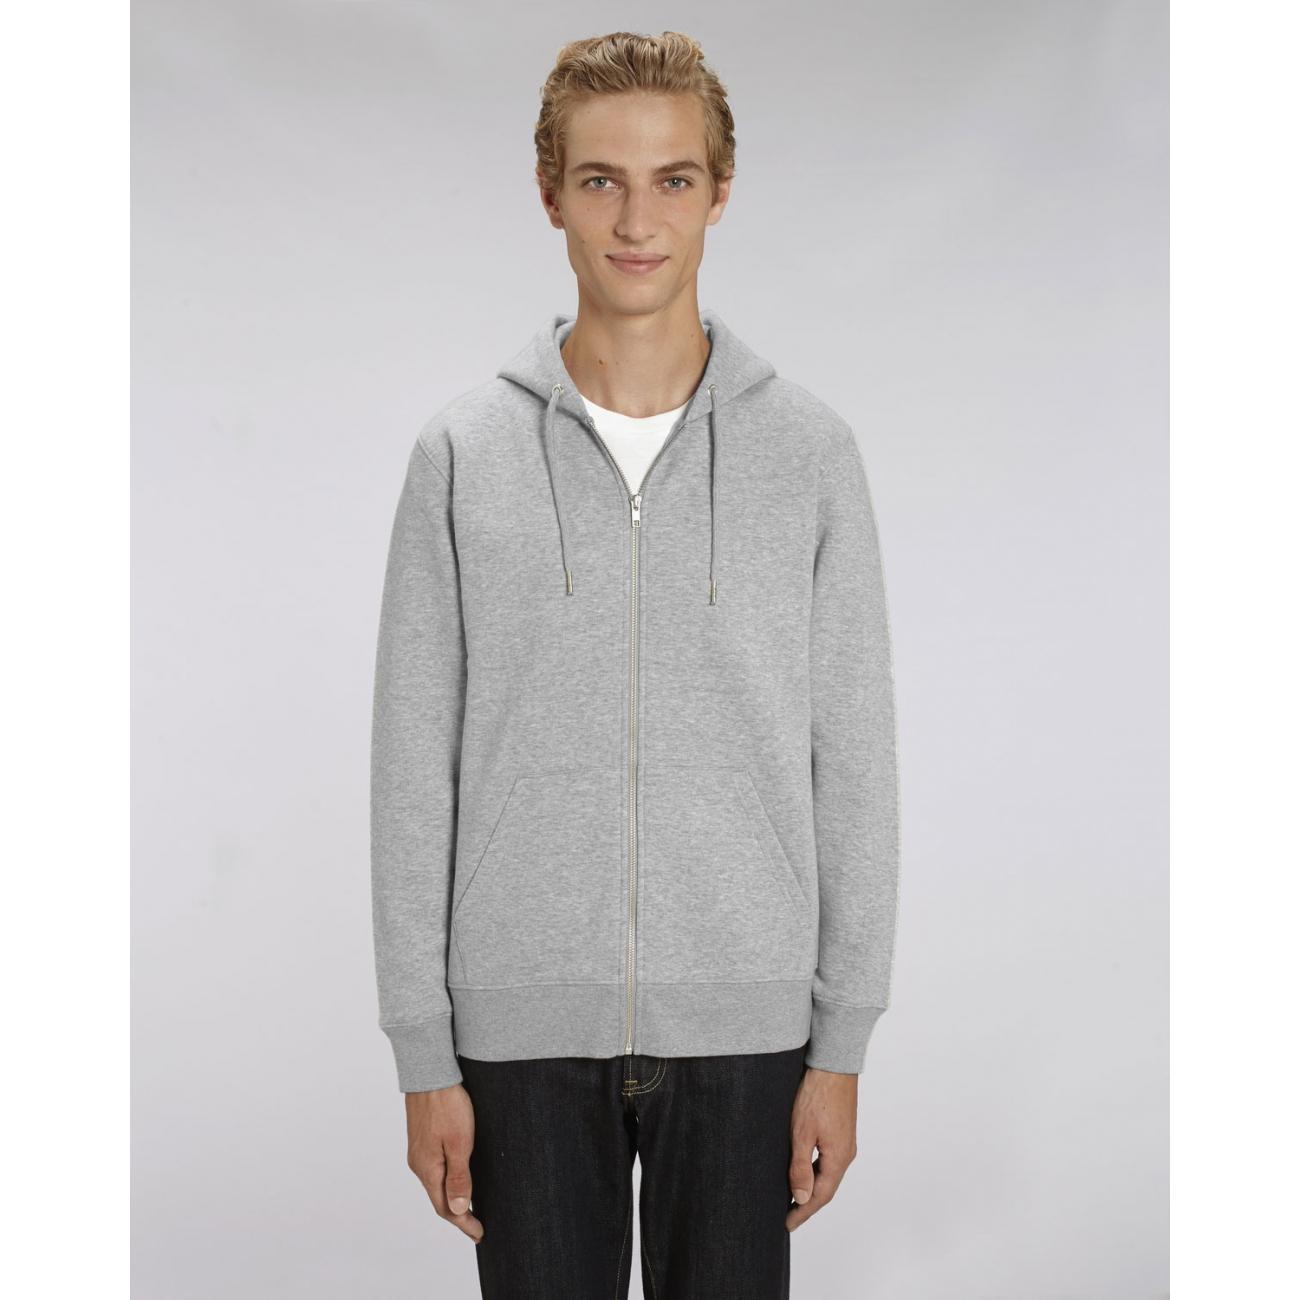 https://tee-shirt-bio.com/7495-thickbox_default/veste-capuche-zippee-homme-coton-bio-gris-chine-cultivator.jpg